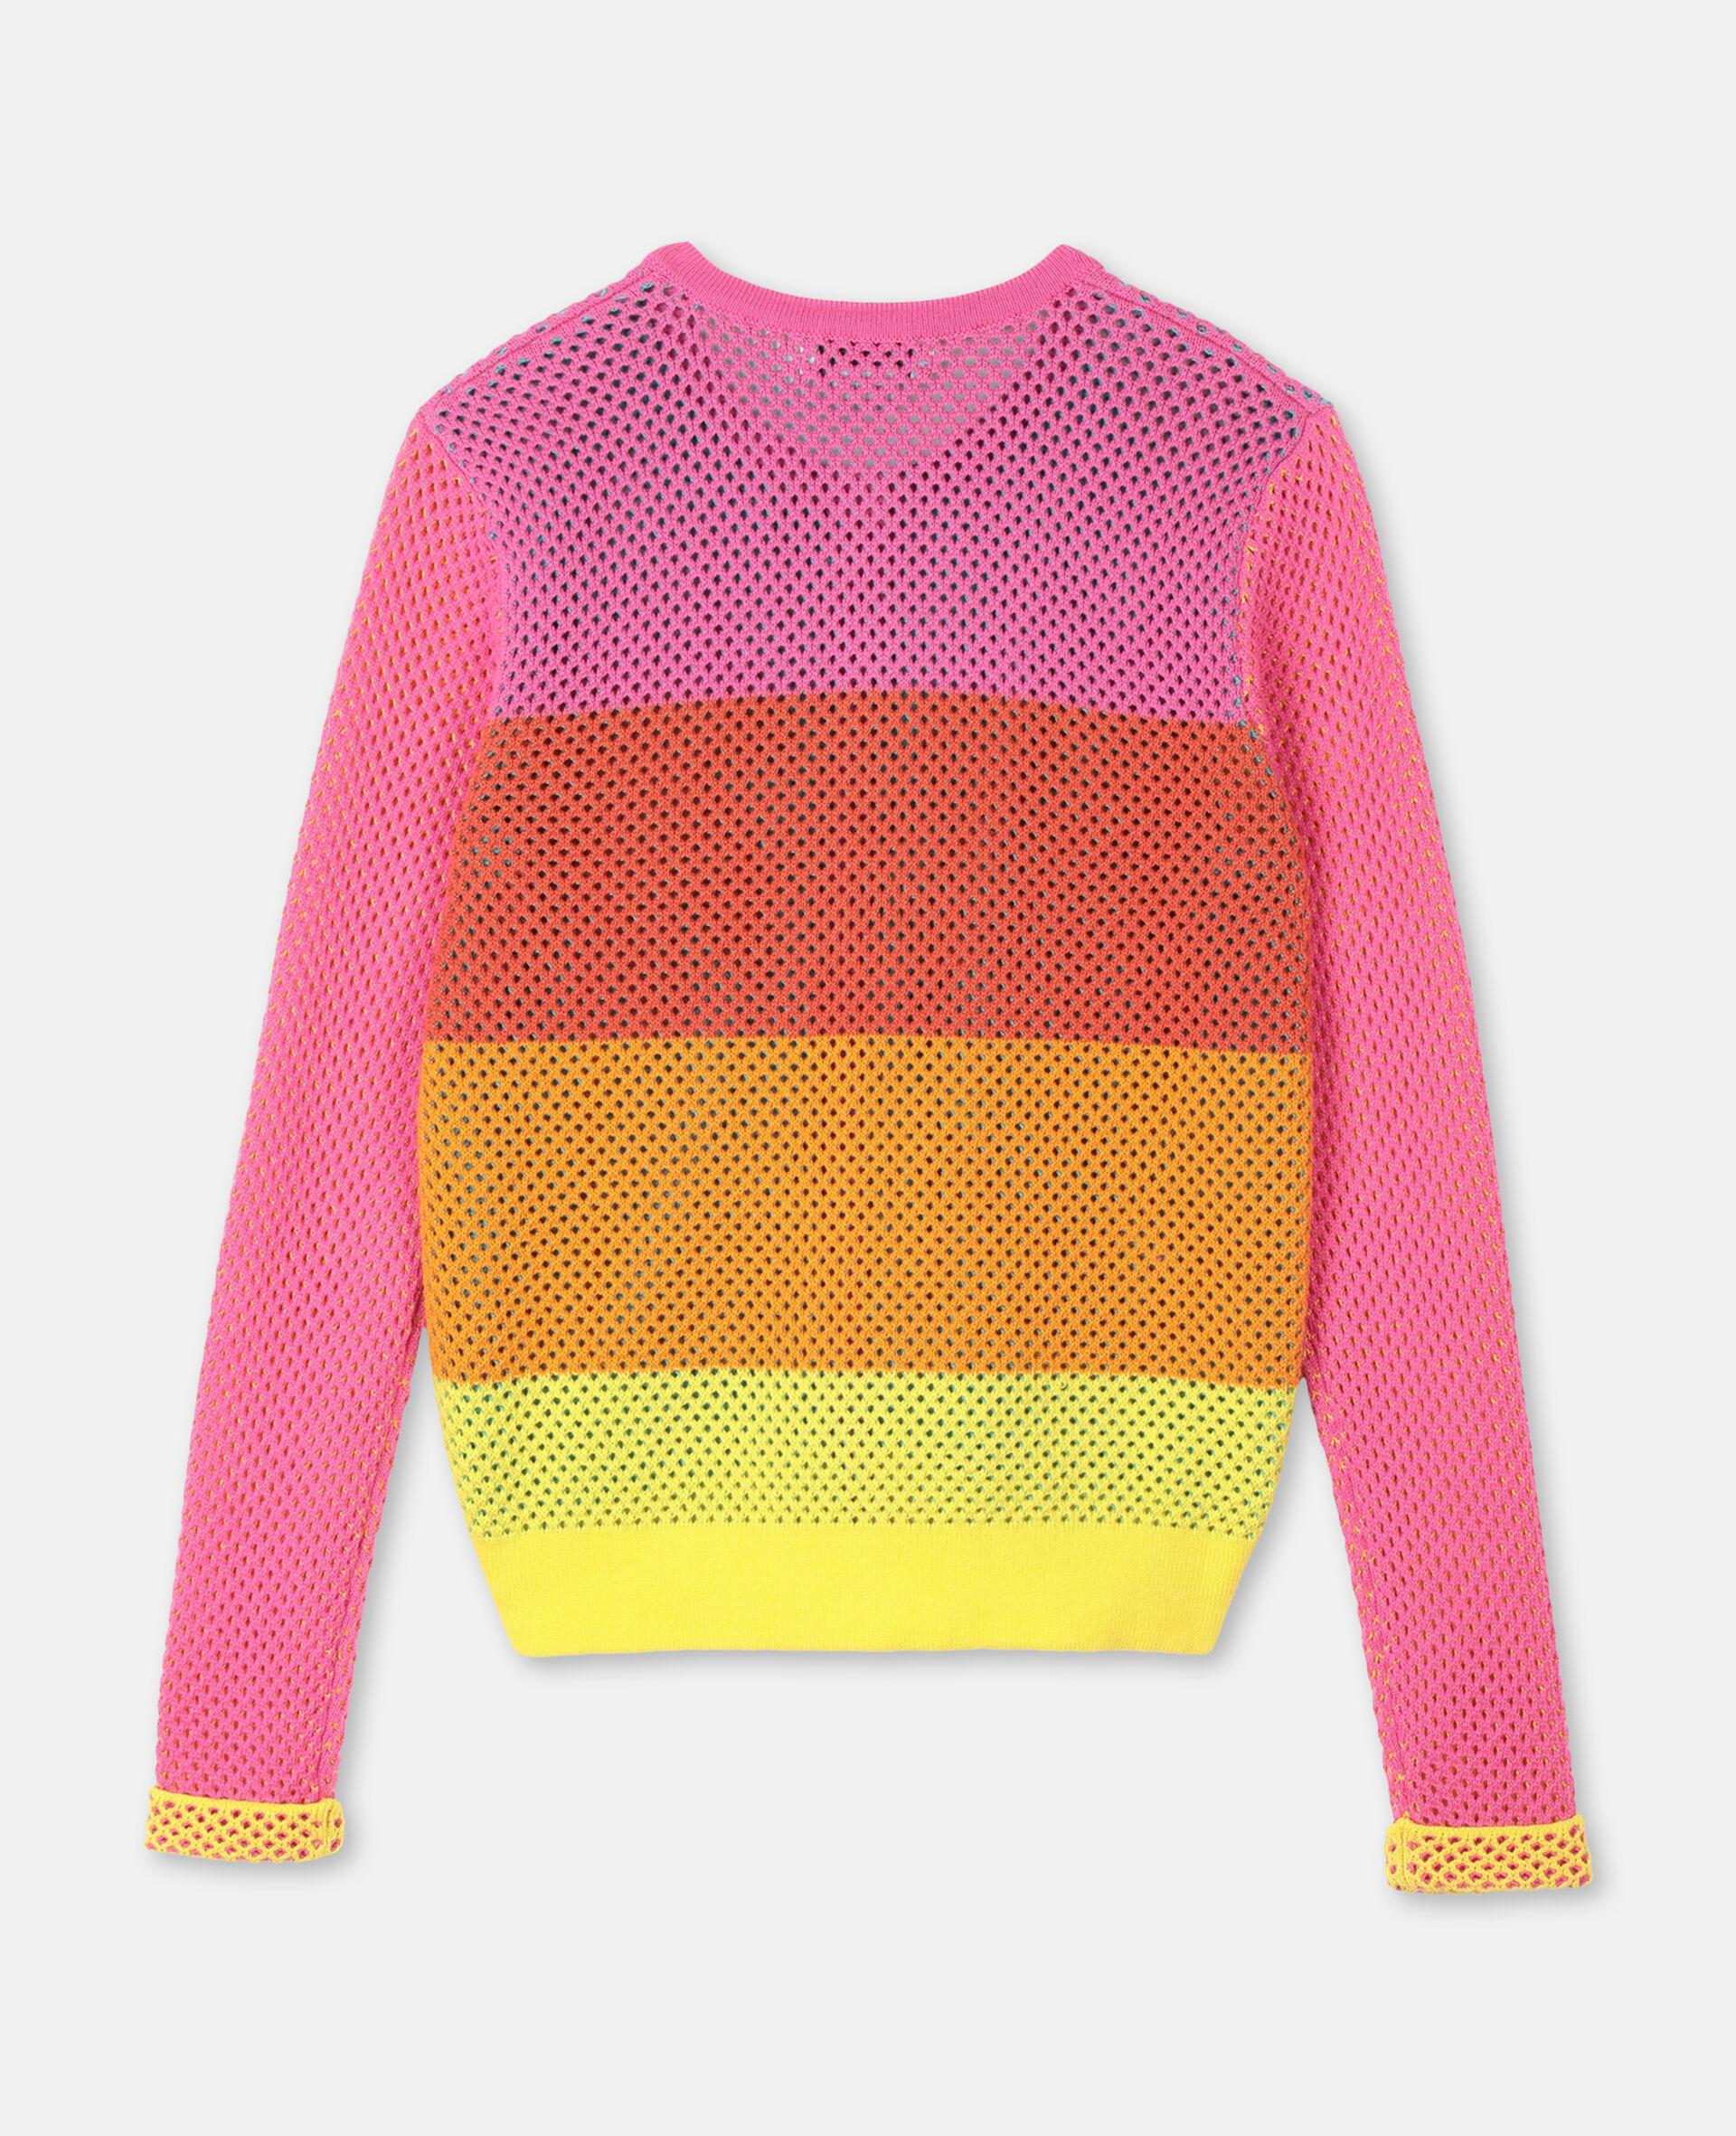 Intarsia Mesh Knit Cotton Cardigan-Multicolour-large image number 3